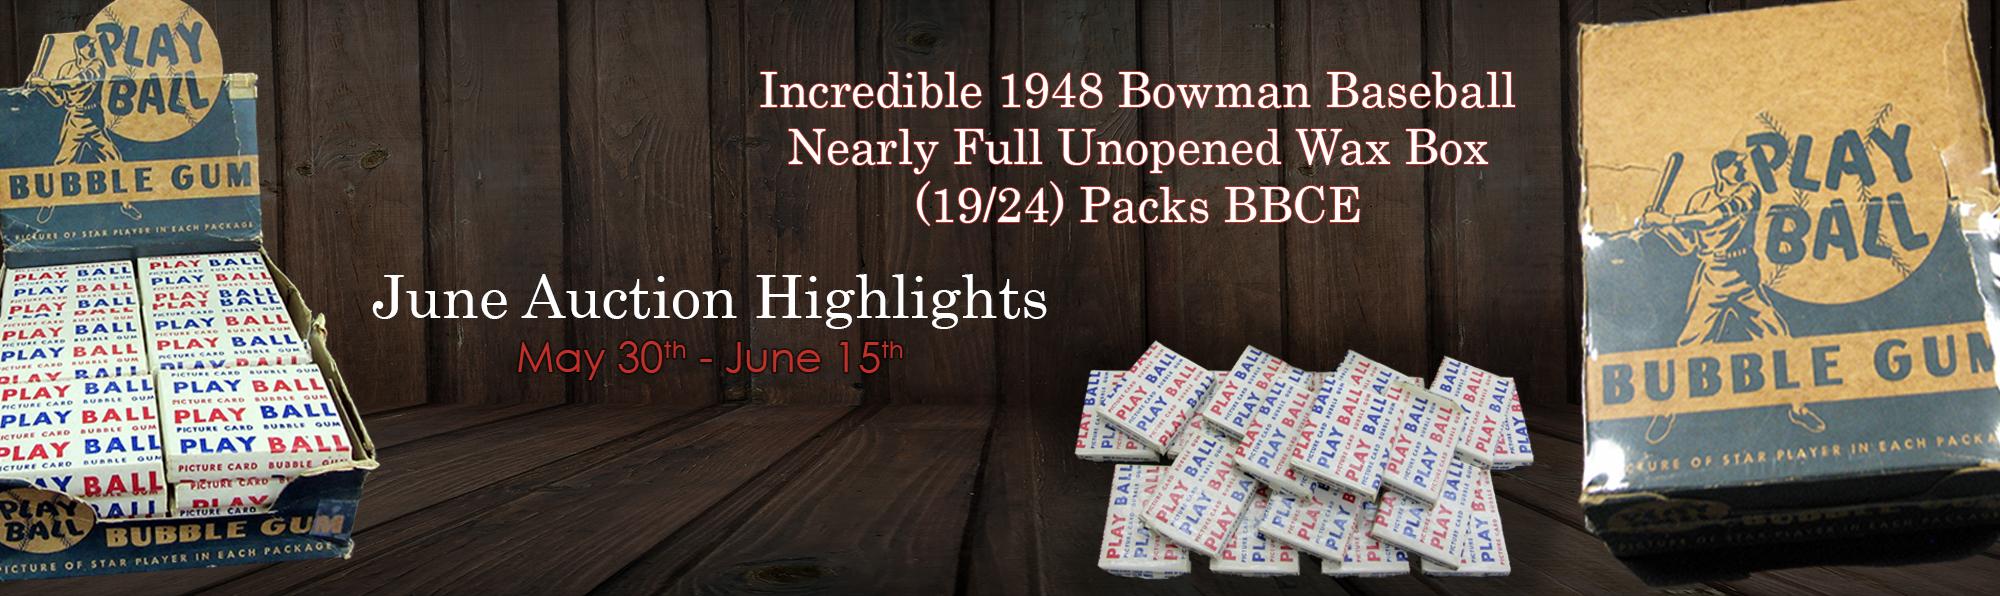 1948 Bowman Baseball Nearly Full Unopened Wax Box (19/24) Packs BBCE